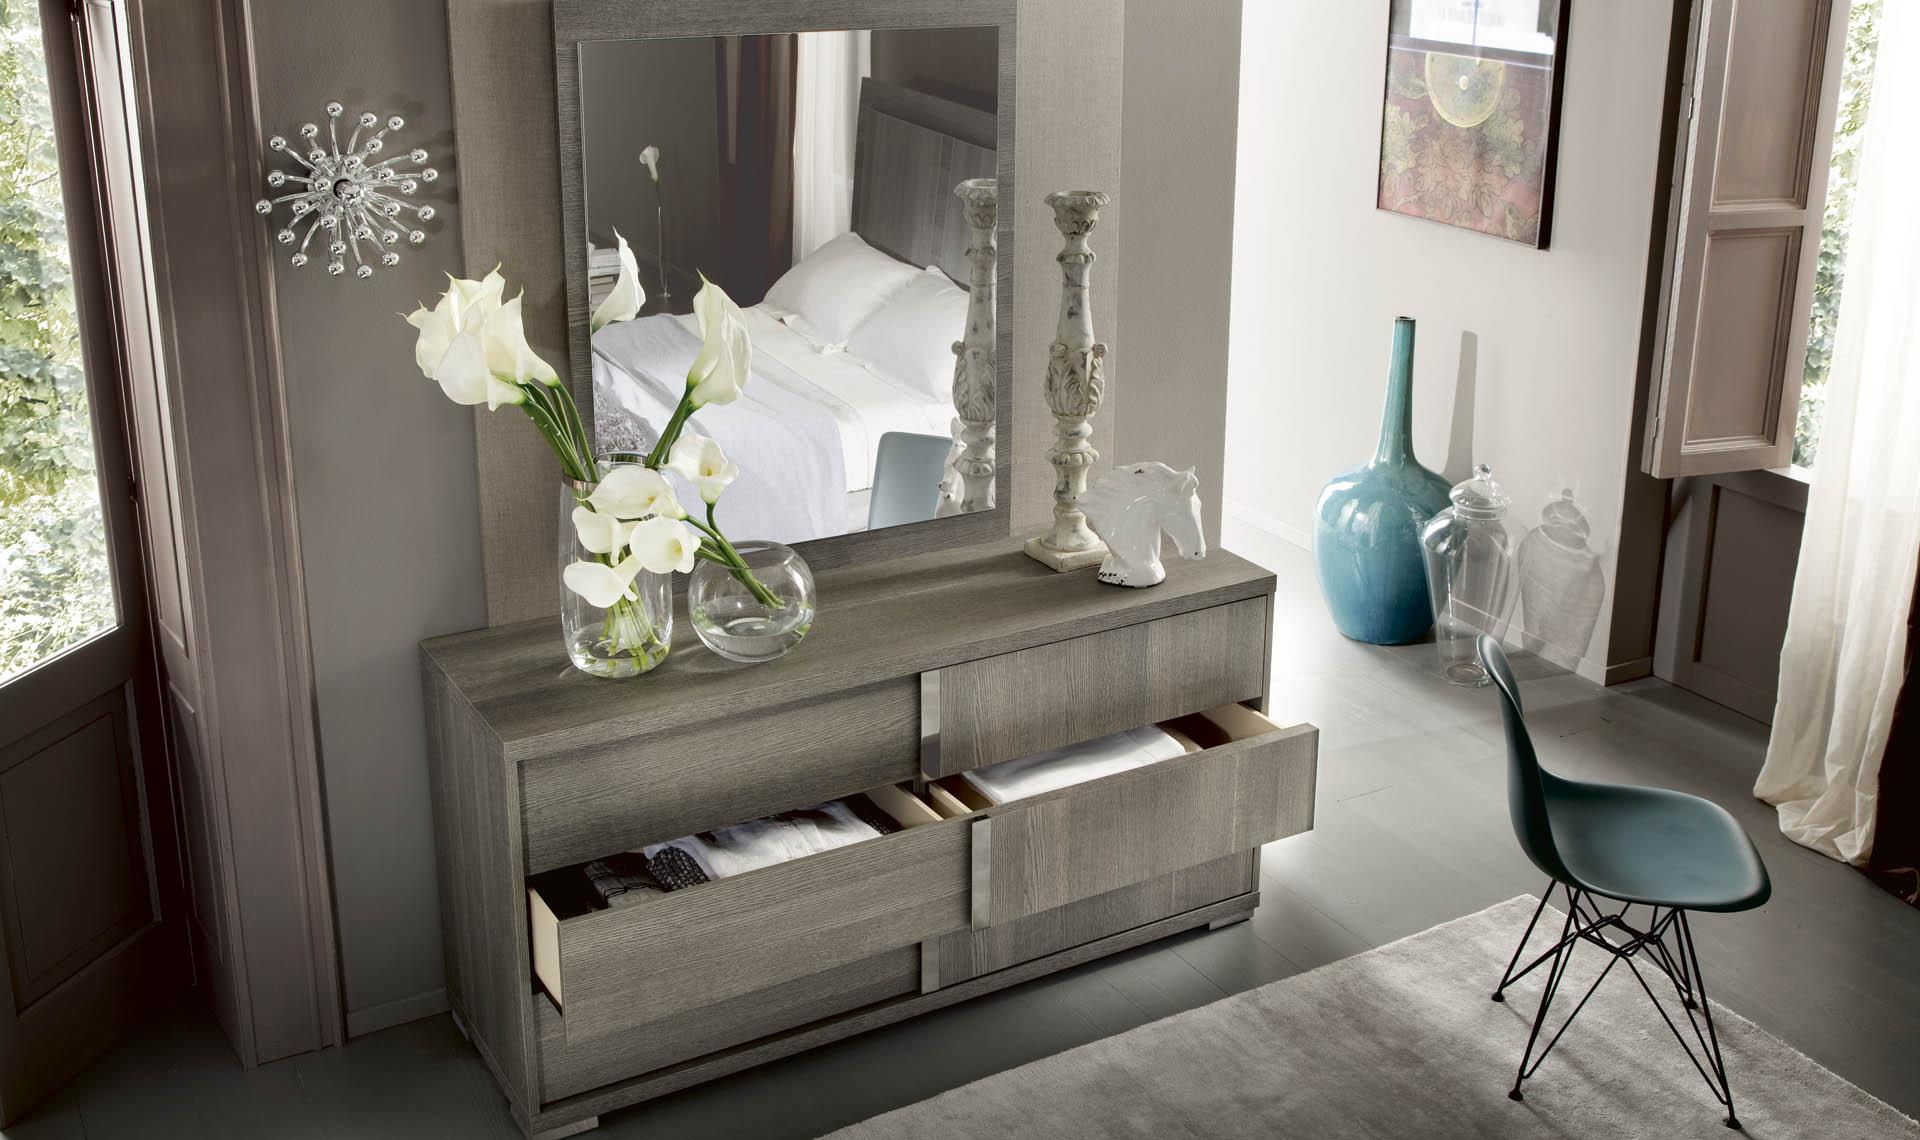 Tivoli Bedroom 3/DRW. Dresser